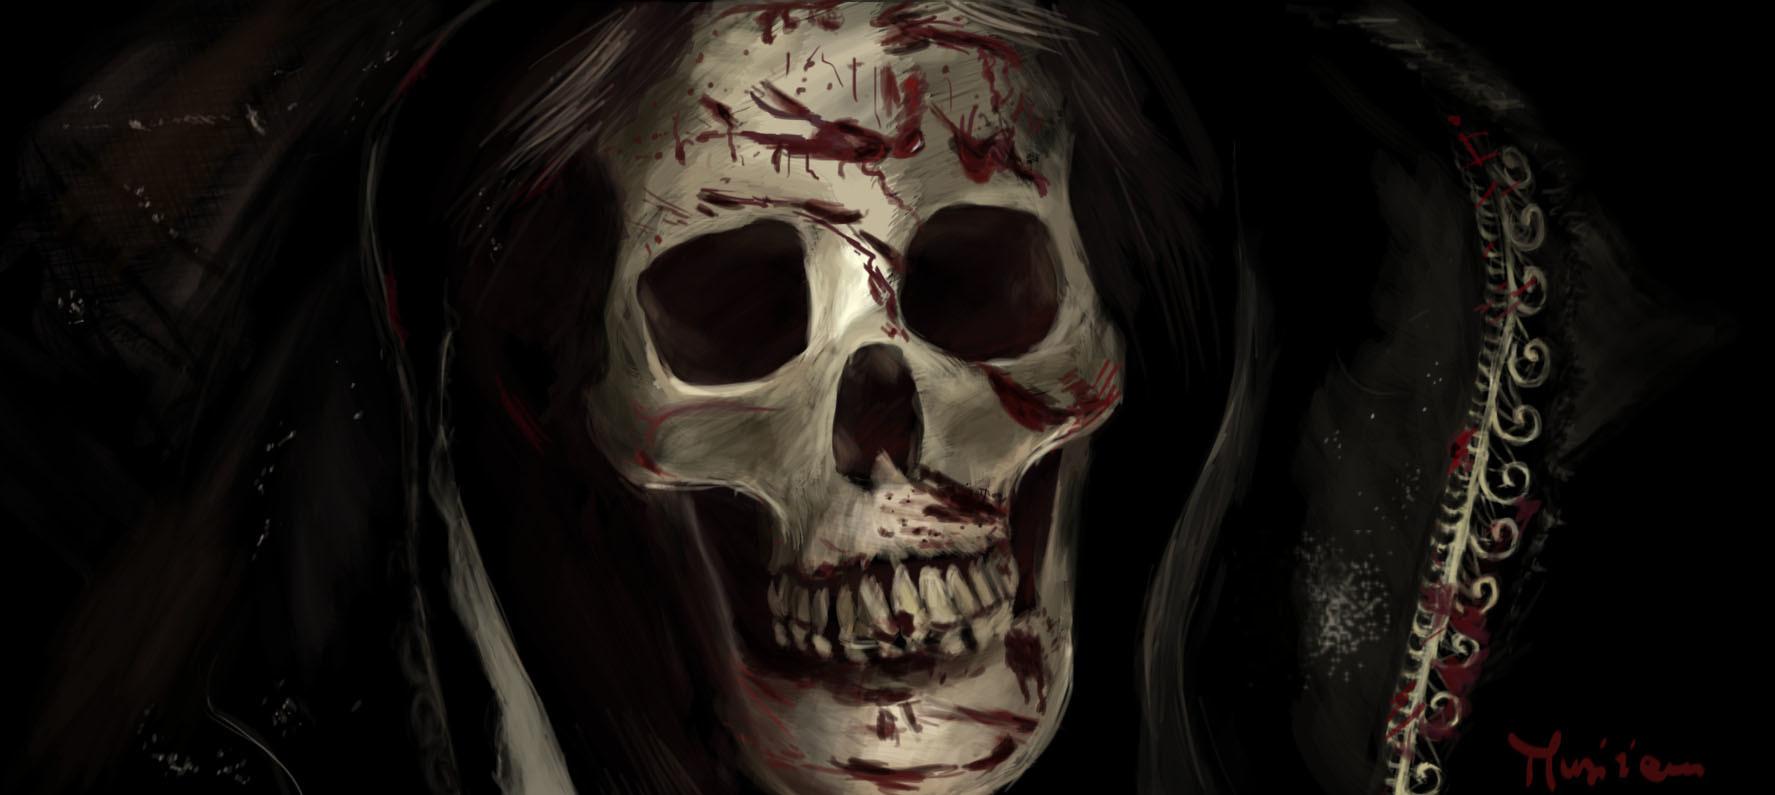 Tom Clancy's Ghost Recon Wildlands Skull   Ghost Recon ...  Skull Ghost Recon Wildlands